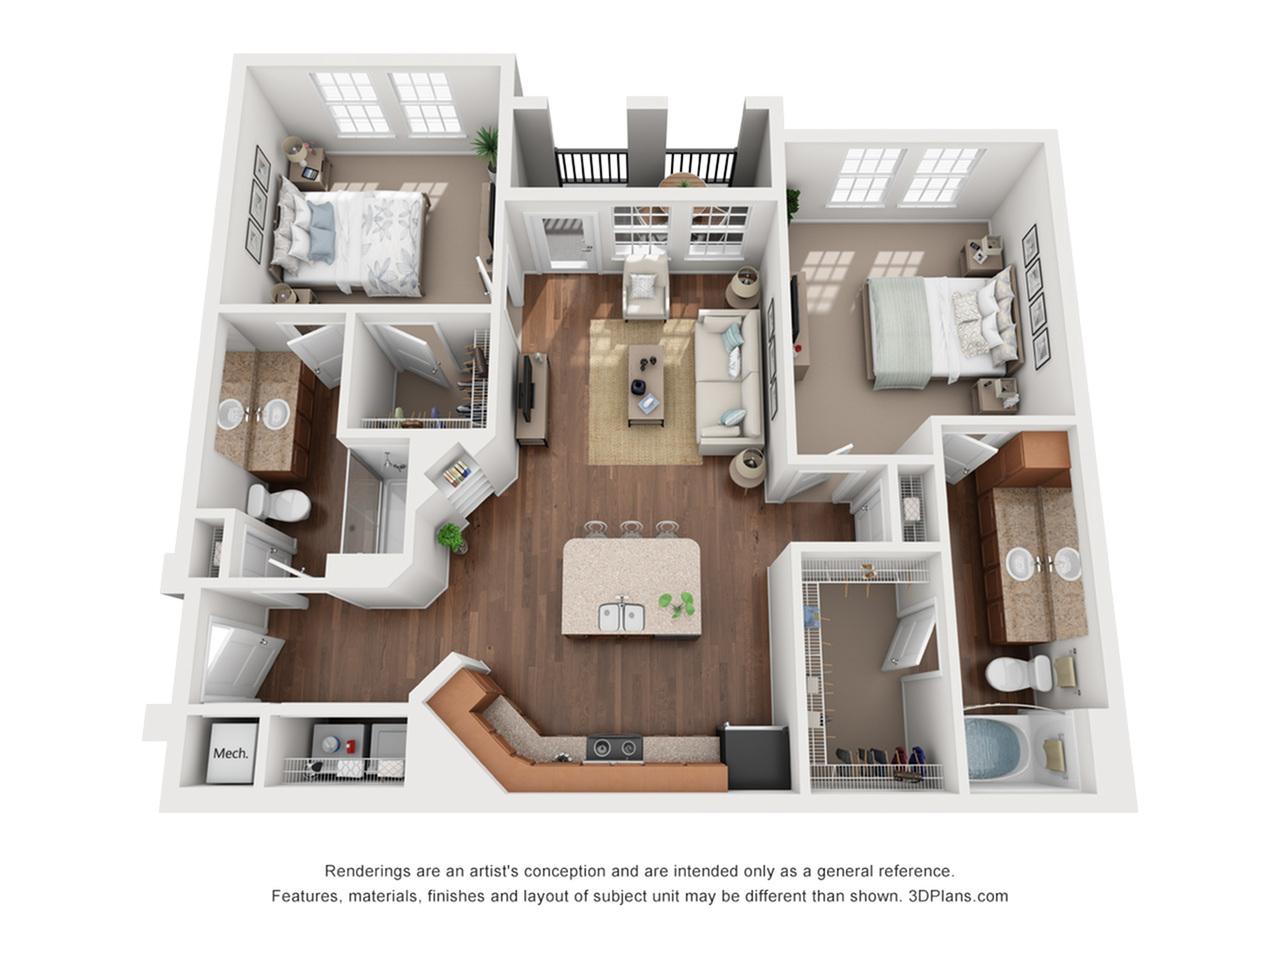 2 Bedrooms Floorplan 2 | The Vineyards at Hammock Ridge